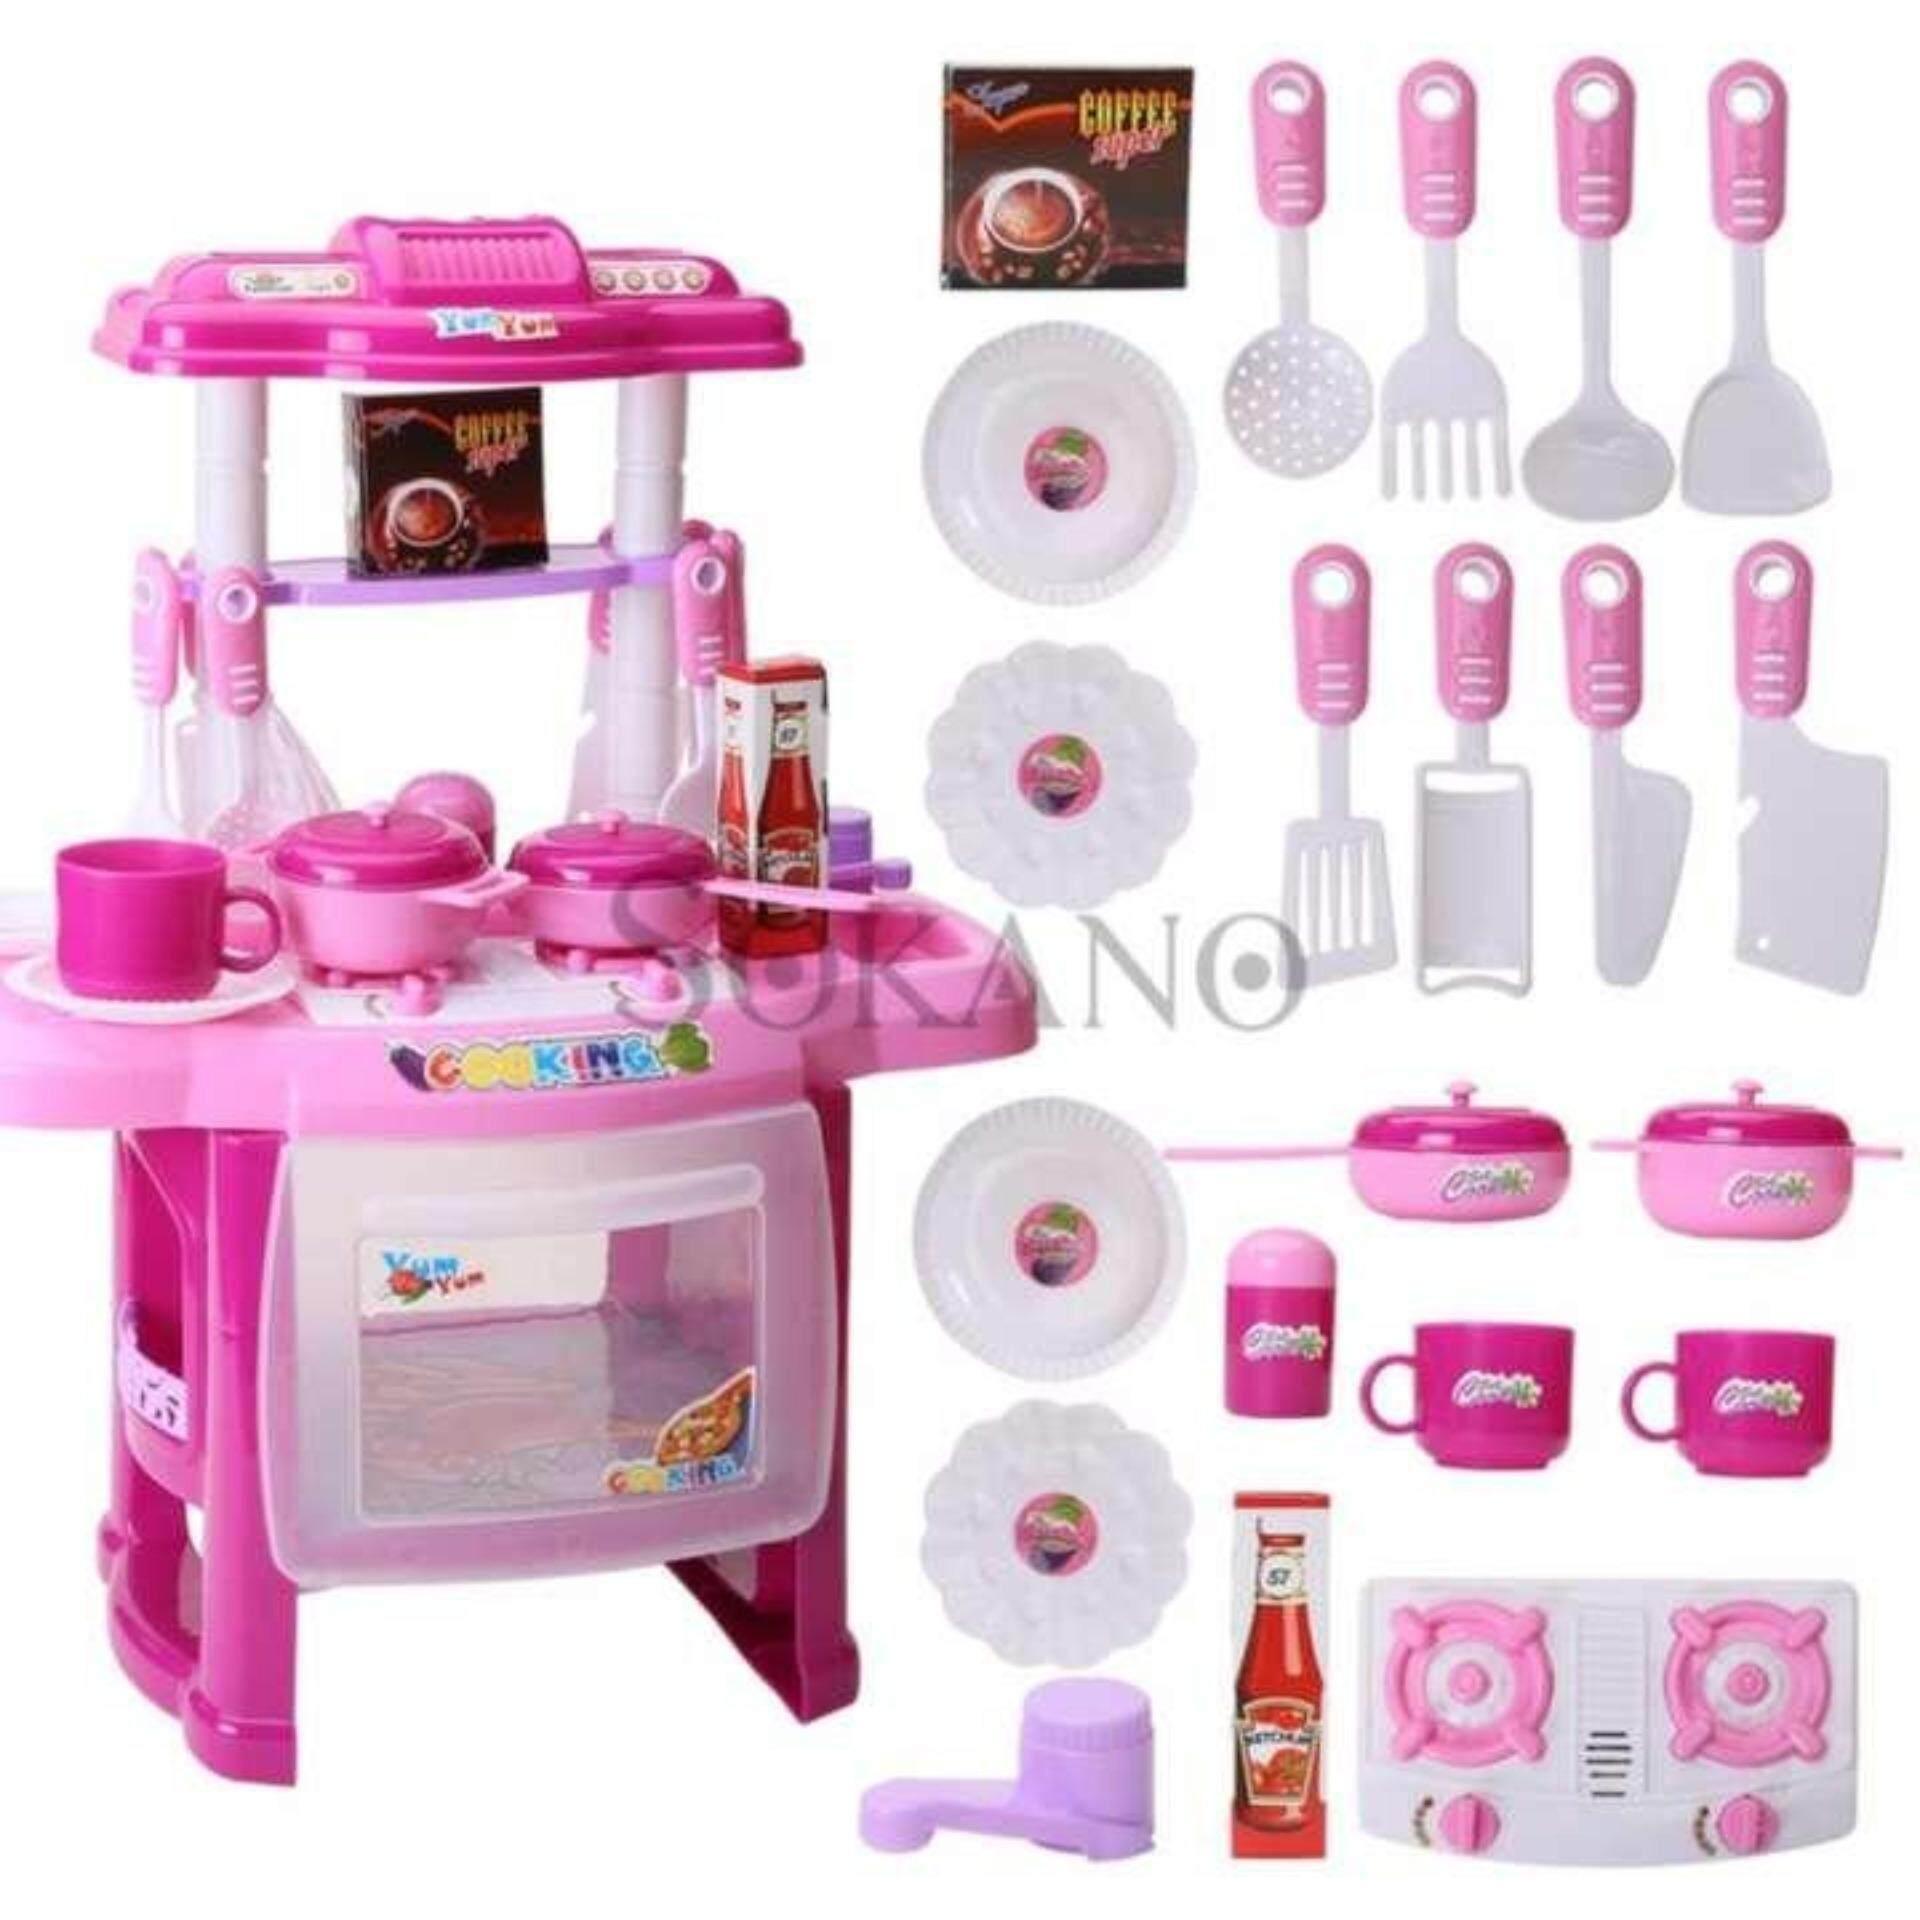 SOKANO Mini Kitchen Fun Playset With Full Utensils Set- Pink toys for girls